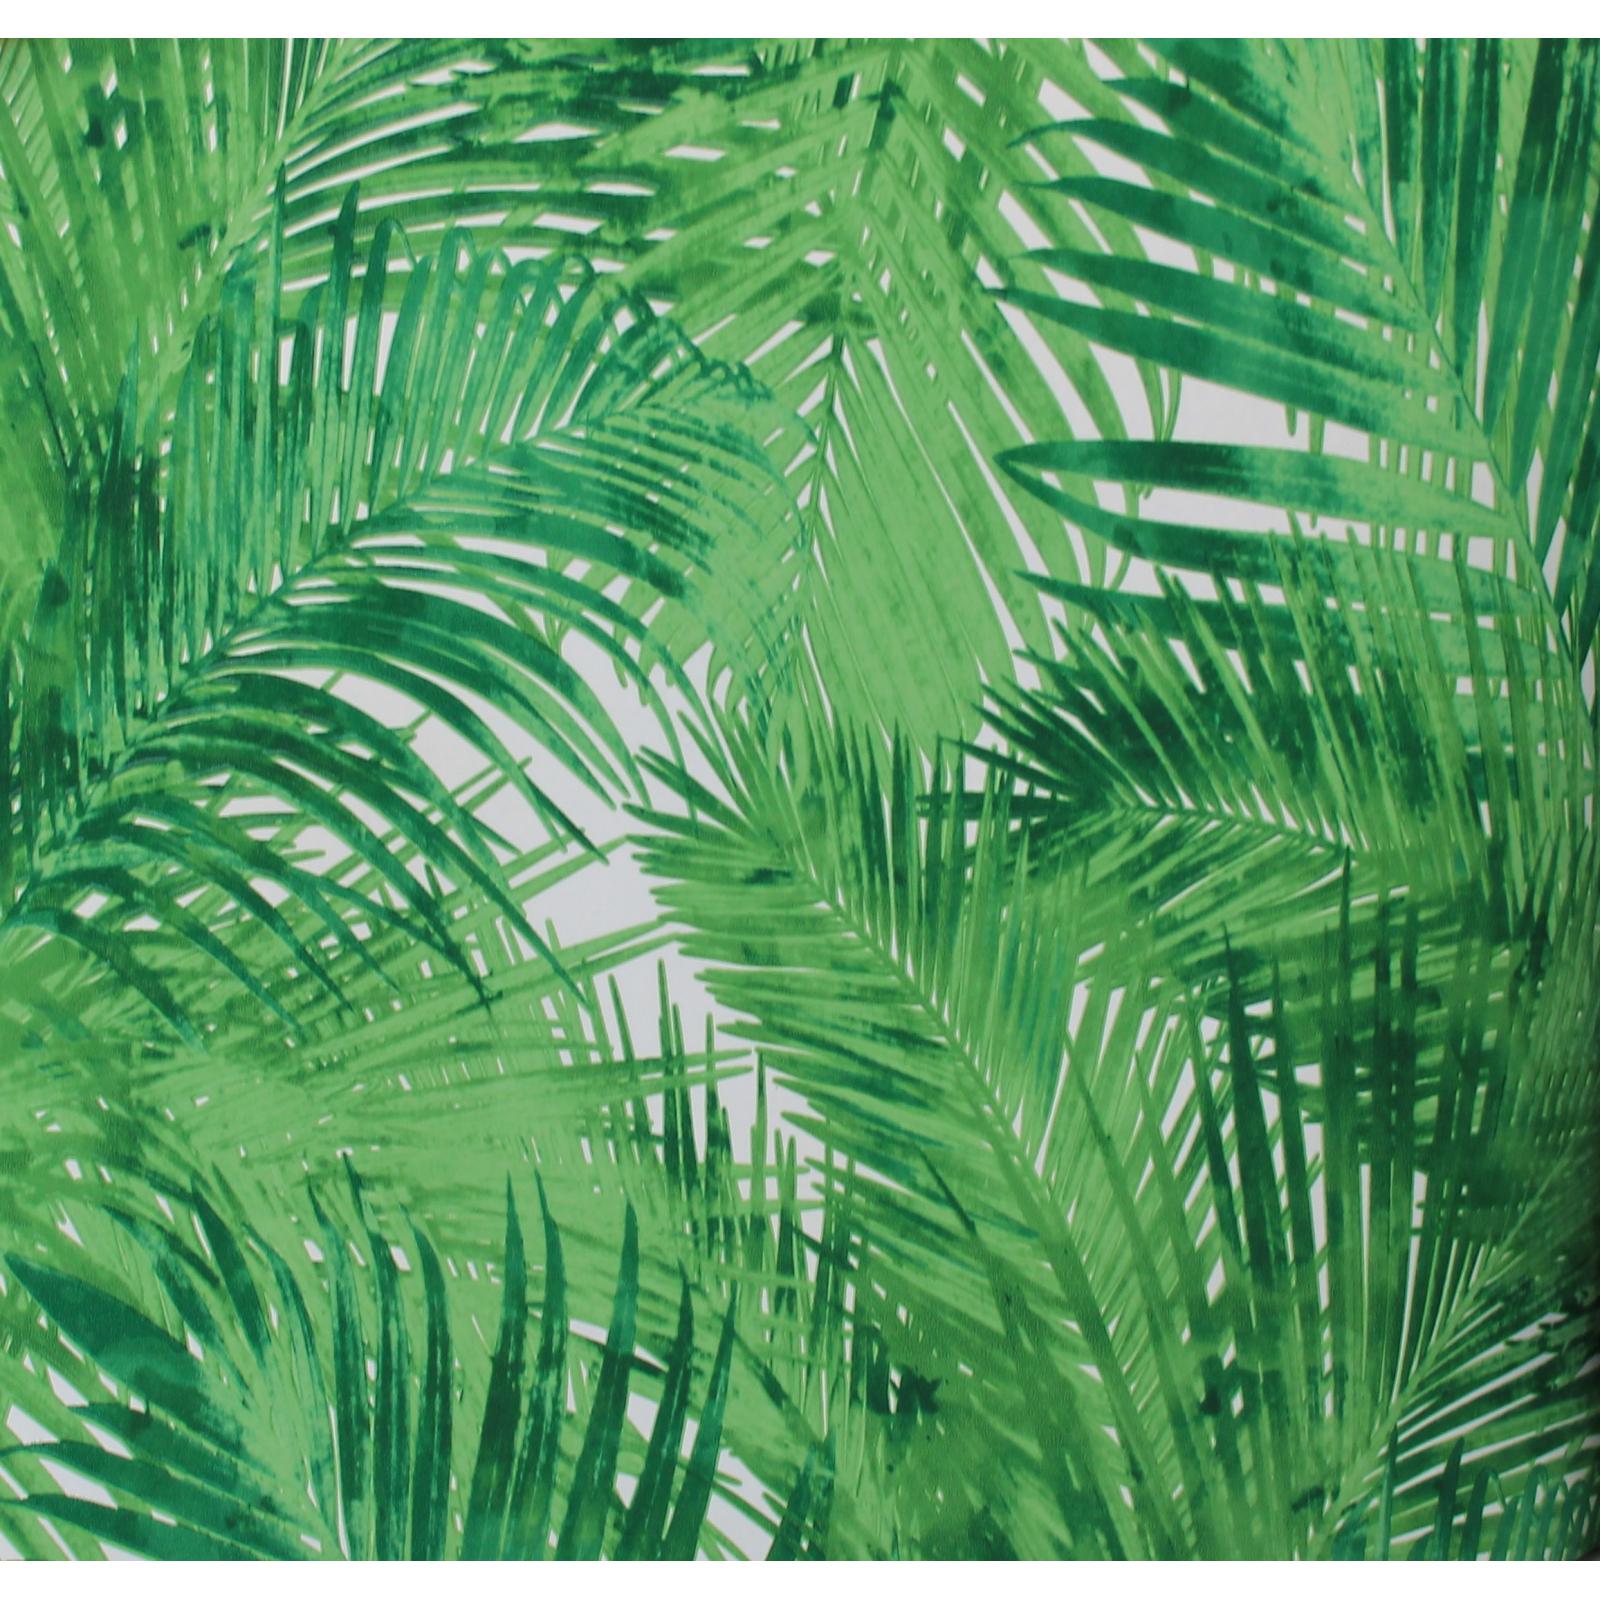 Carta Da Parati Texture carta da parati effetto foglie verdi